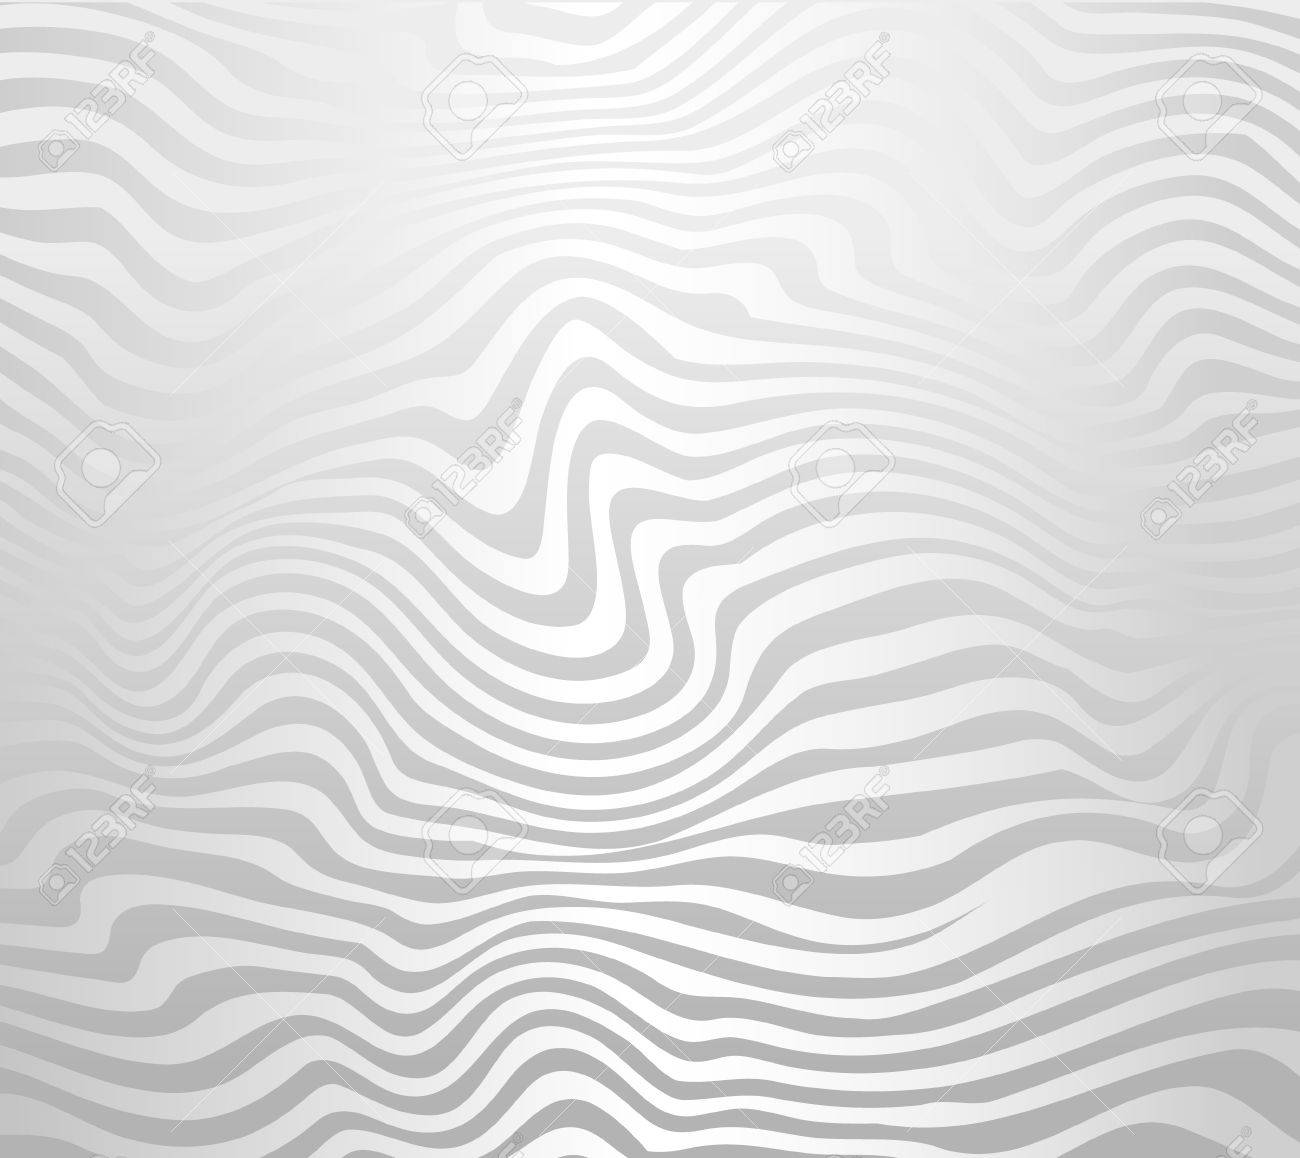 Metal, Alloy Background Stock Vector - 22371968